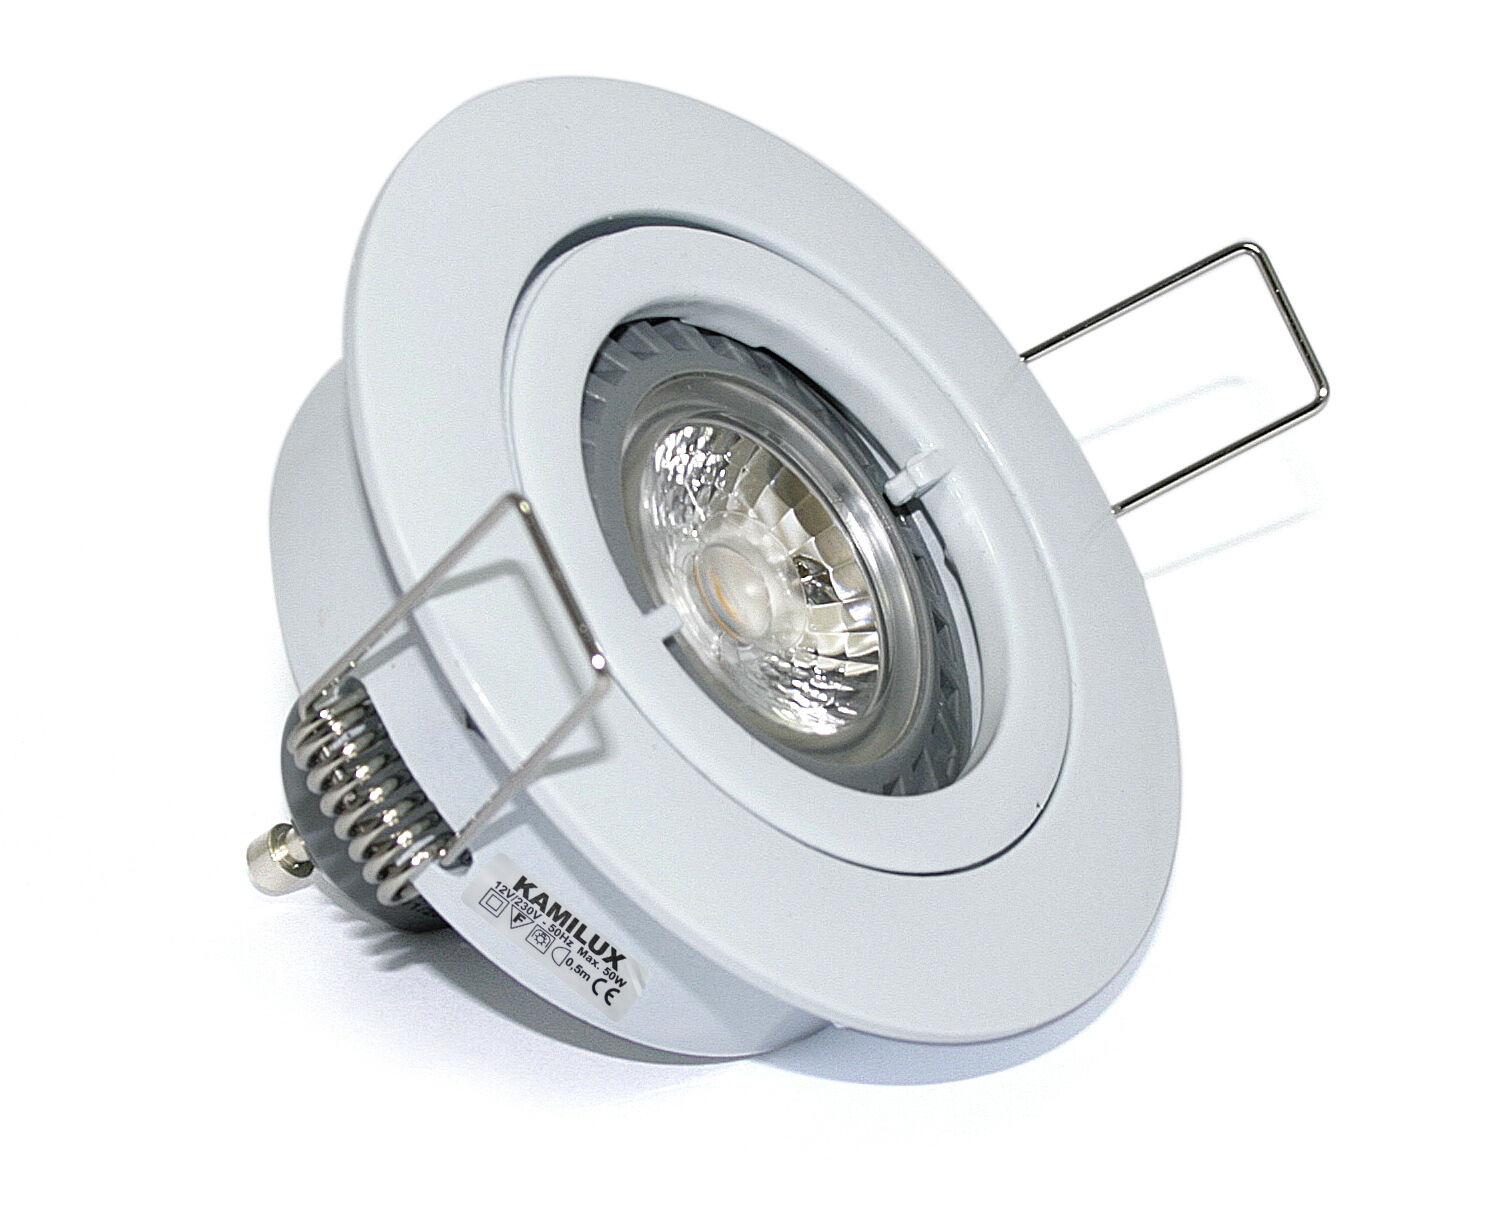 12V Niedervolt Einbaustrahler inkl. 5 Watt = 50W COB LED Leuchtmittel, MR16 5W